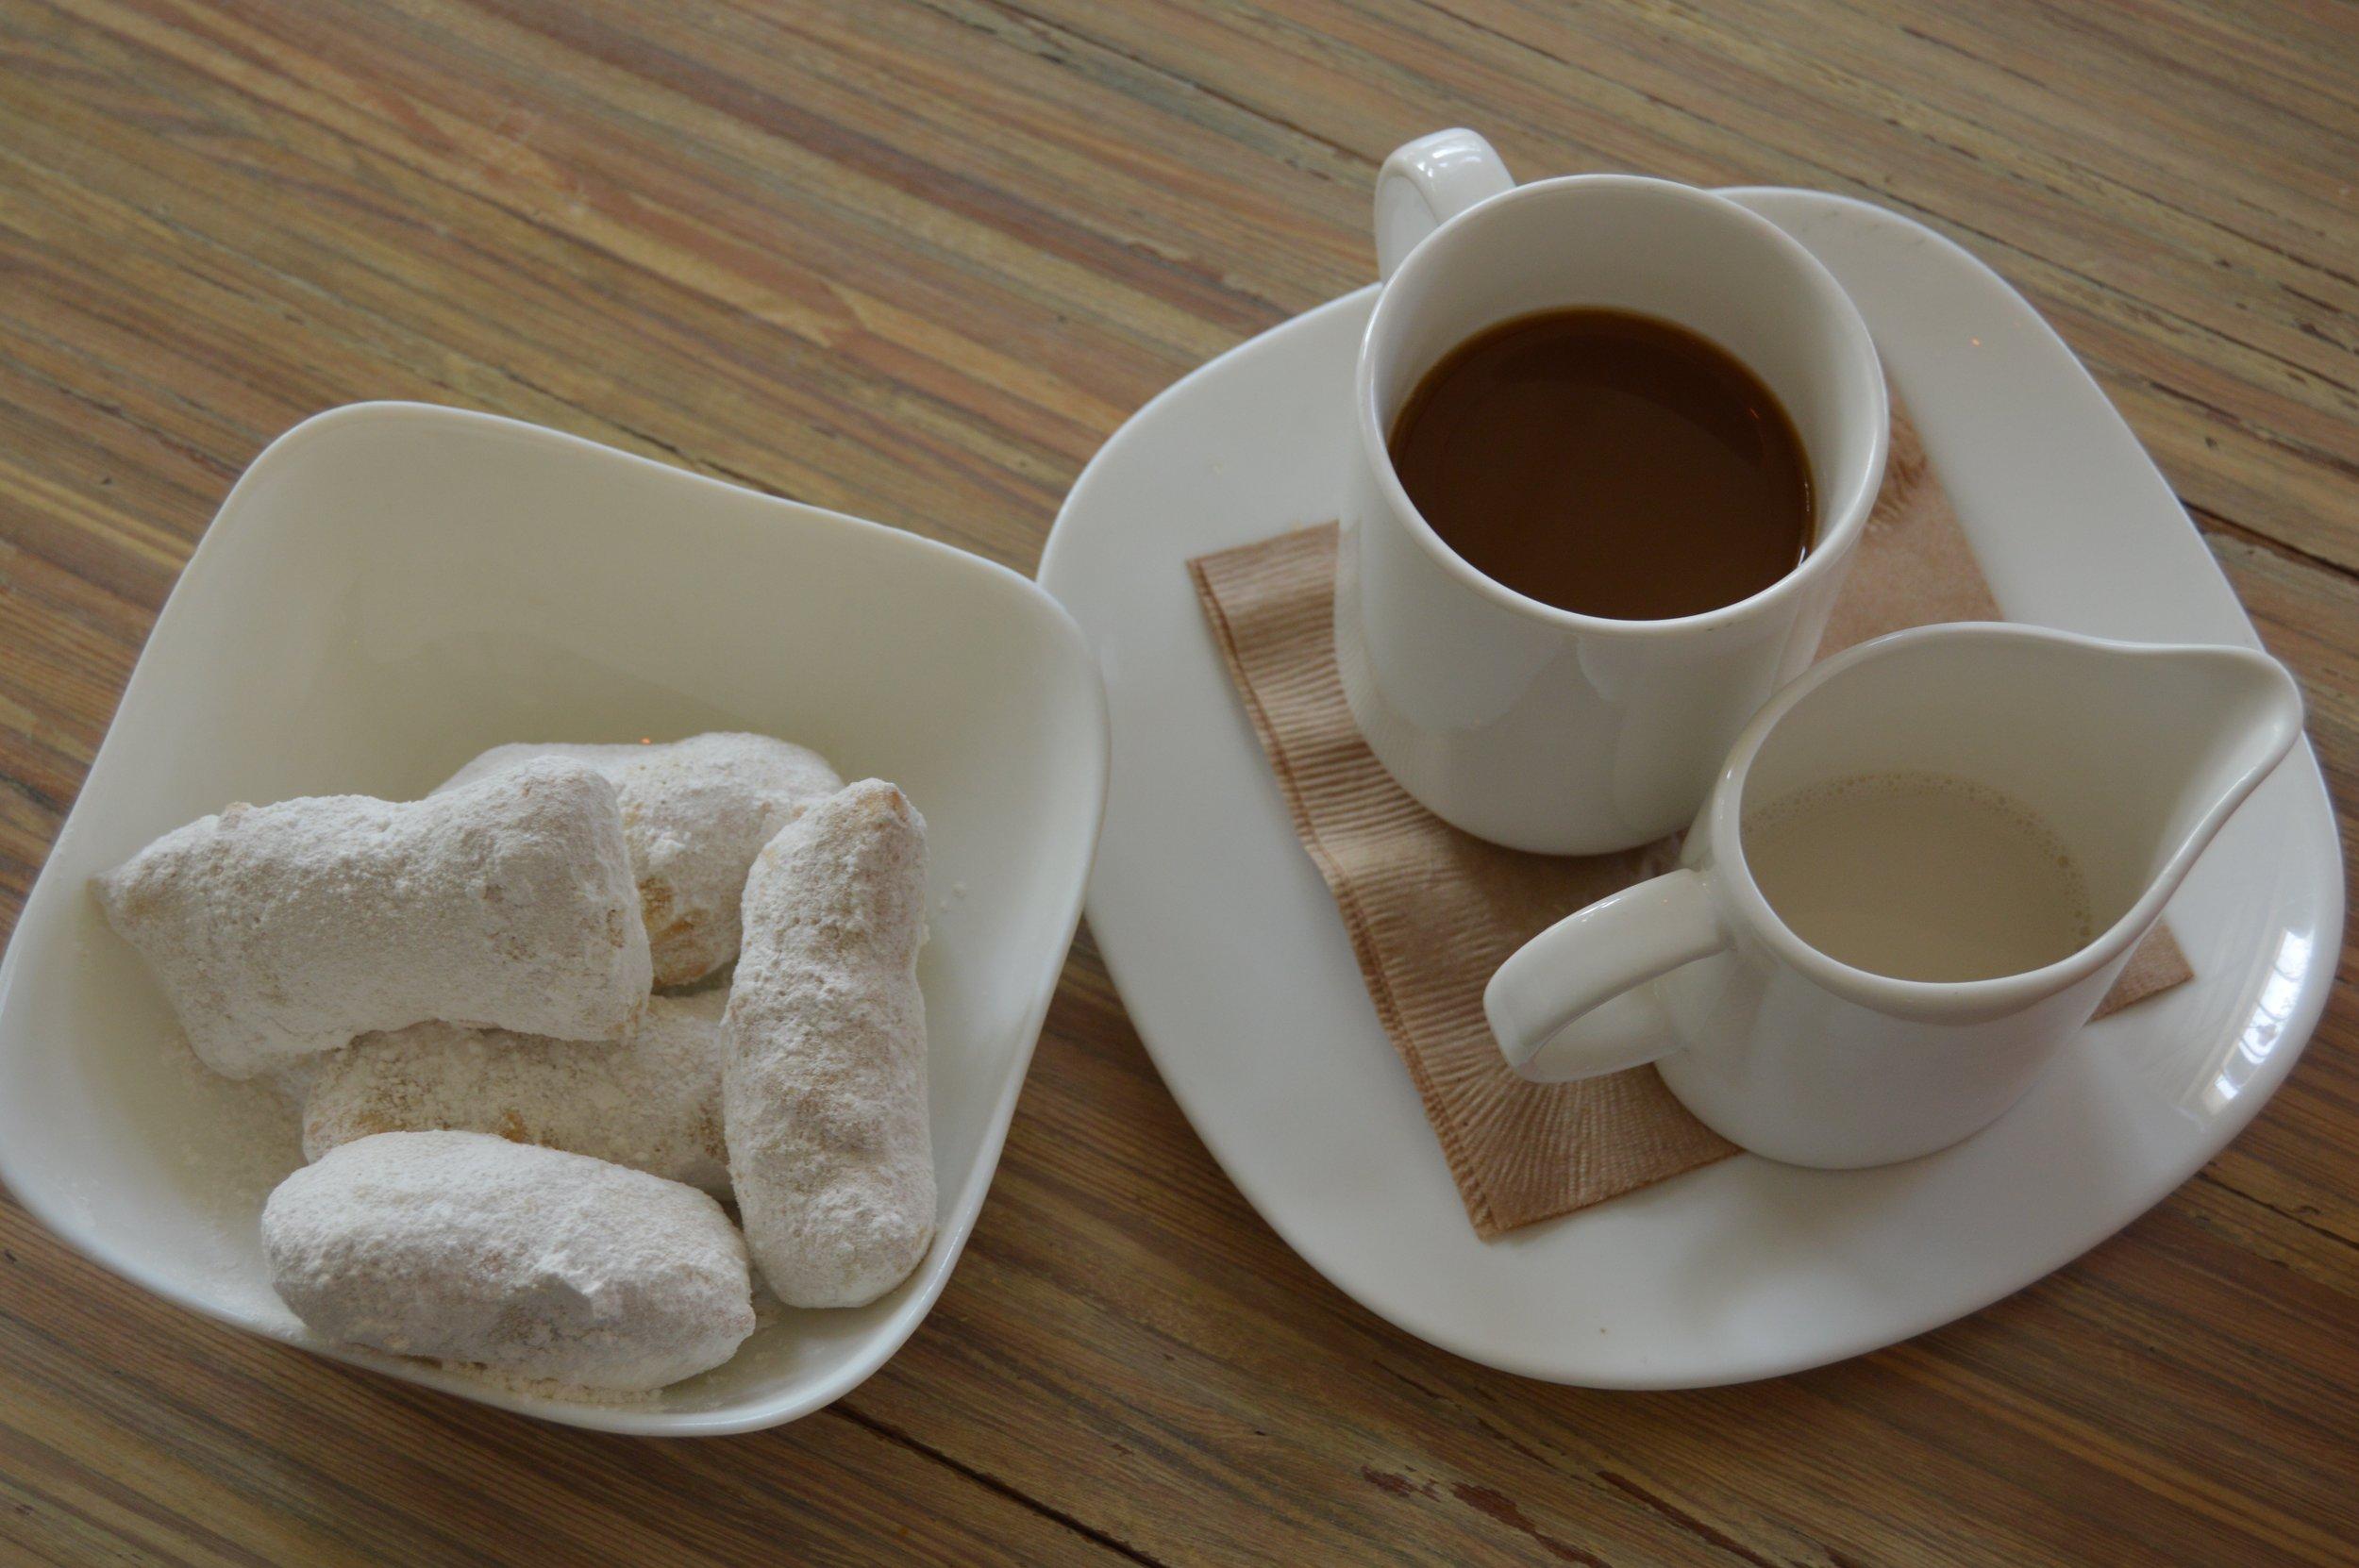 Fresh Vegan Beignets with Coffee